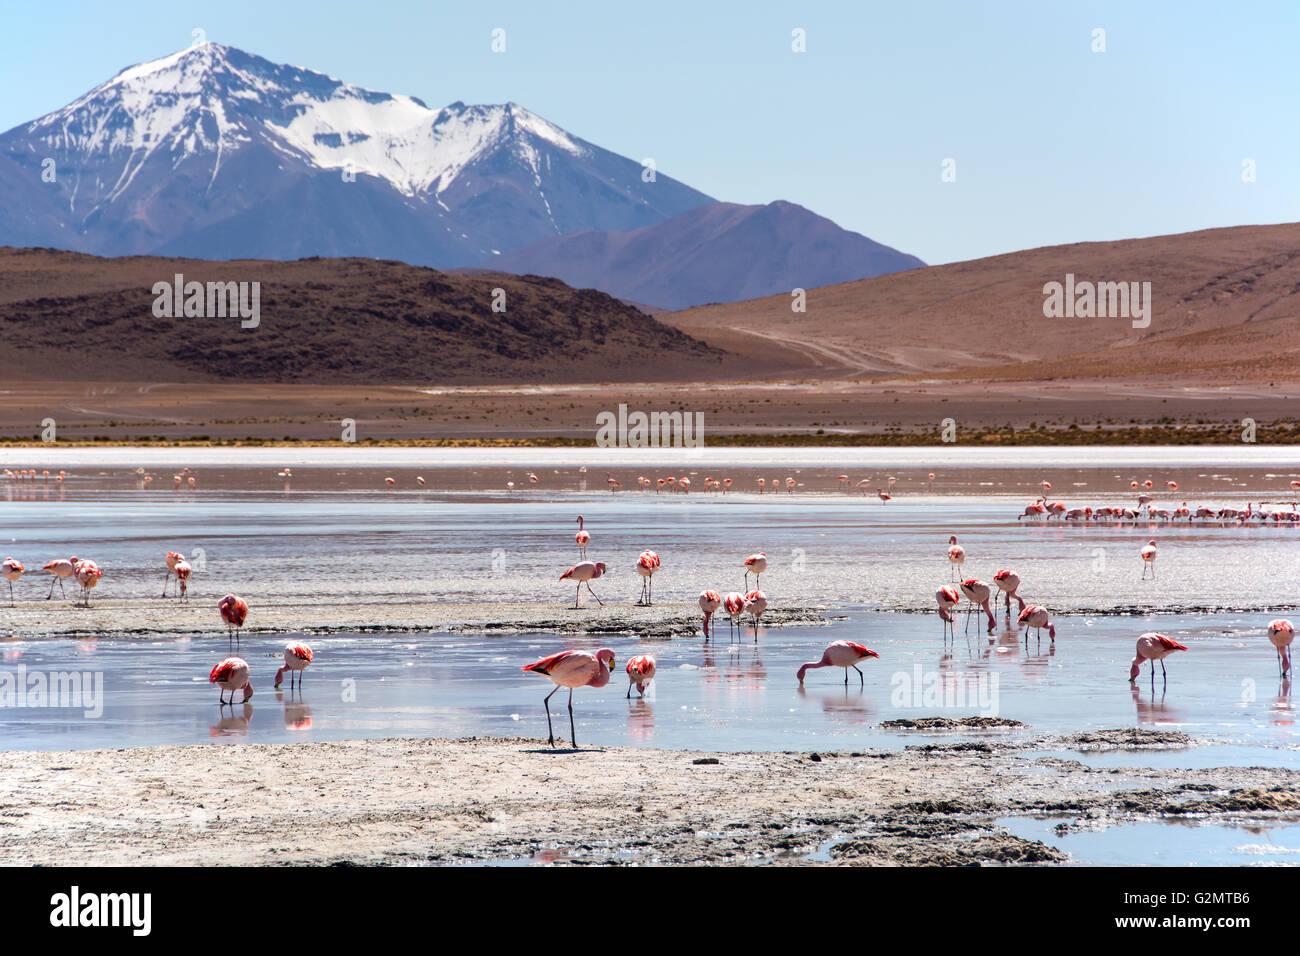 Laguna Hedionda with James's flamingos (Phoenicoparrus jamesi) in shallow water, near Uyuni, Lipez, Bolivia - Stock Image